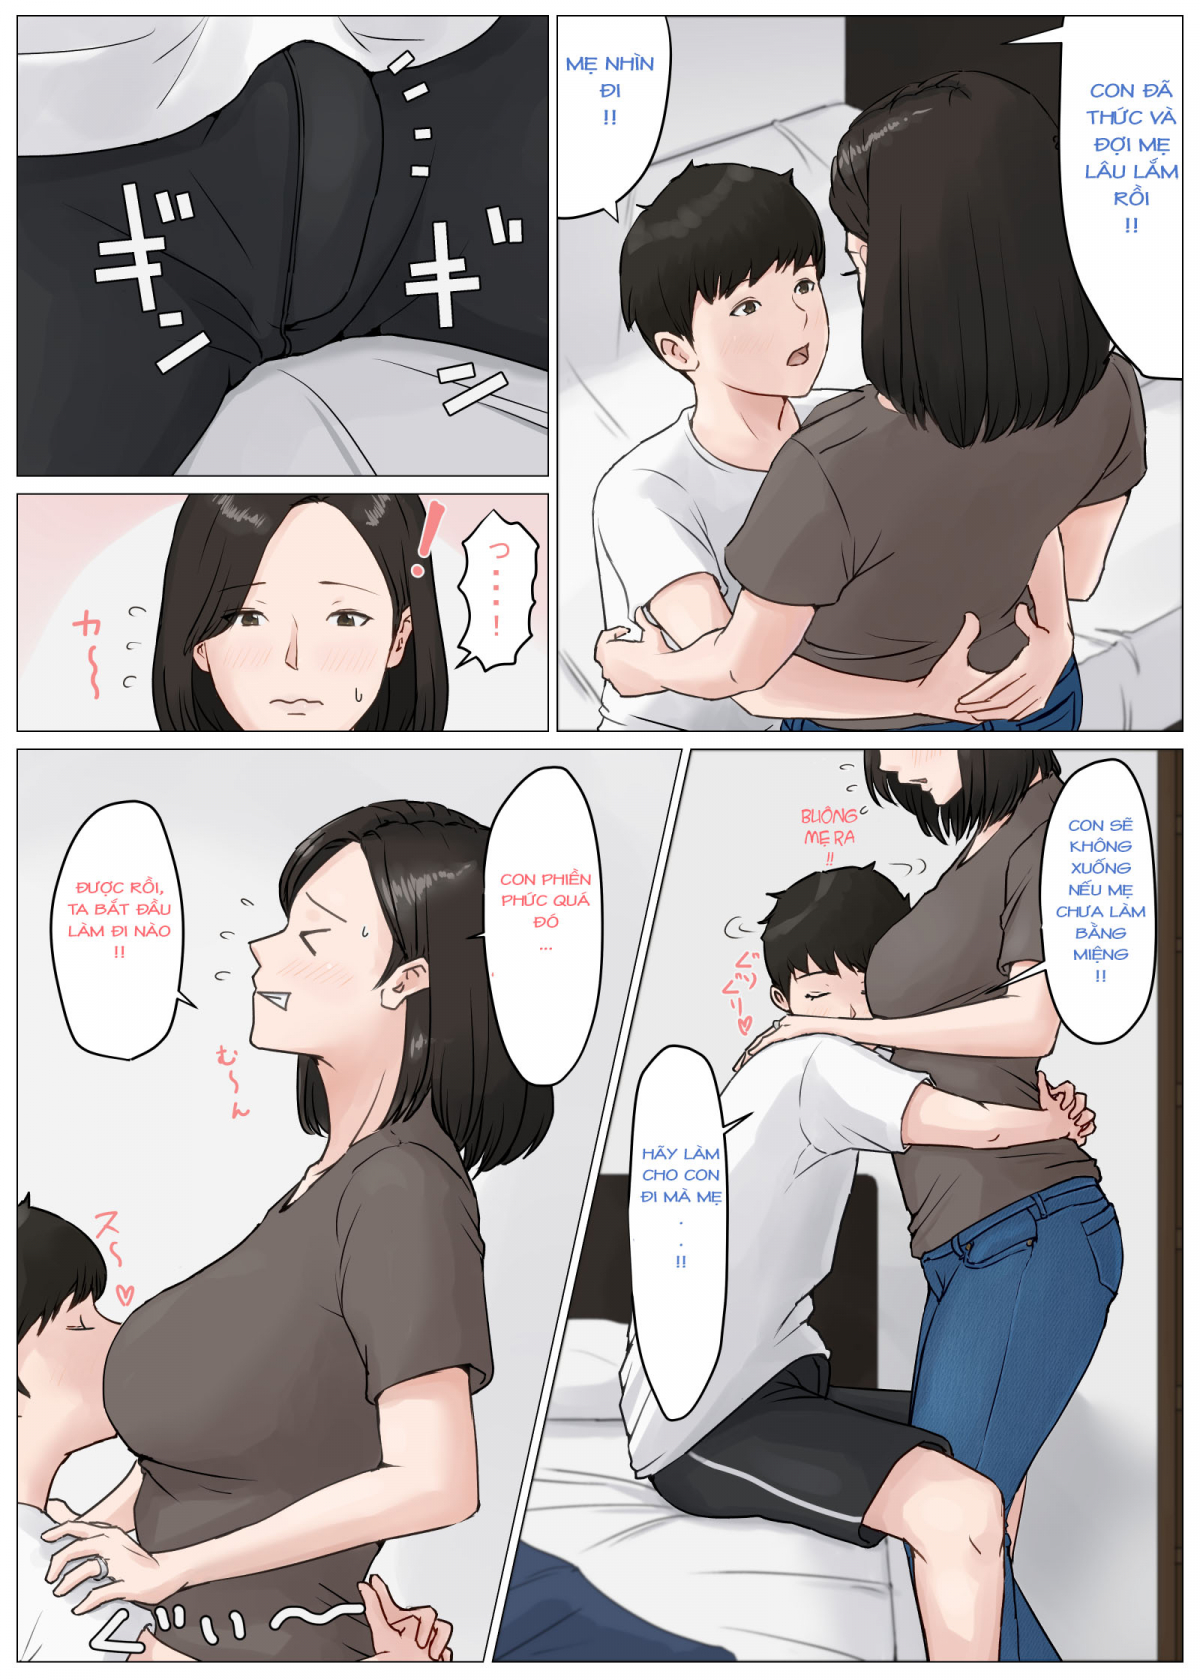 HentaiVN.net - Ảnh 5 - Kaa-san Janakya Dame Nanda!! 3 ~Natsuyasumi Zenpen~ - Mother it has to be you ~Summer Holiday First Part 1~ - Oneshot